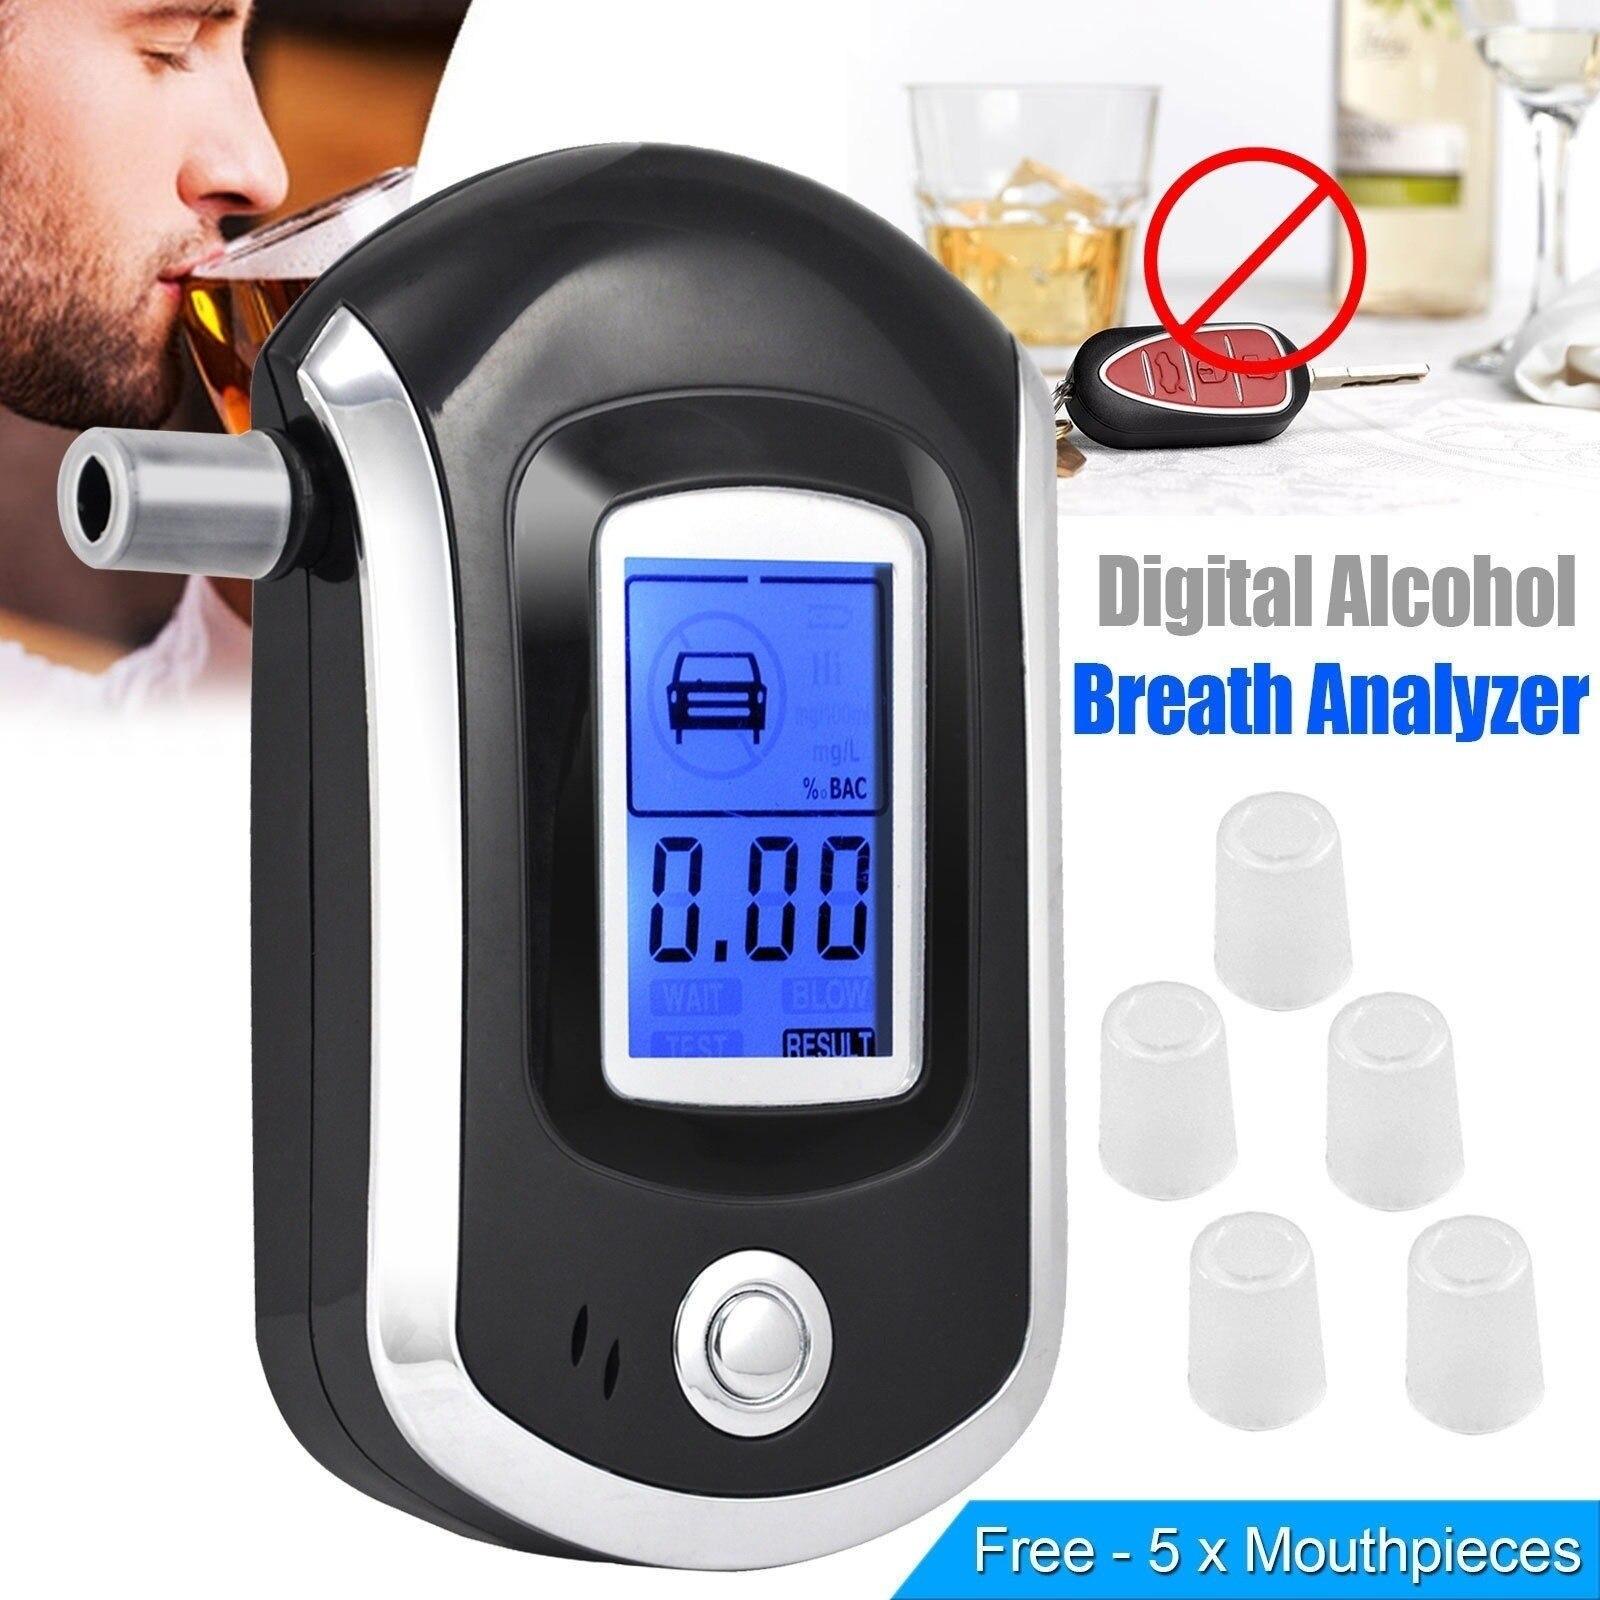 Professional Digital Breath Alcohol Tester Breathalyzer AT6000 Alcohol Breath Tester Alcohol Detector